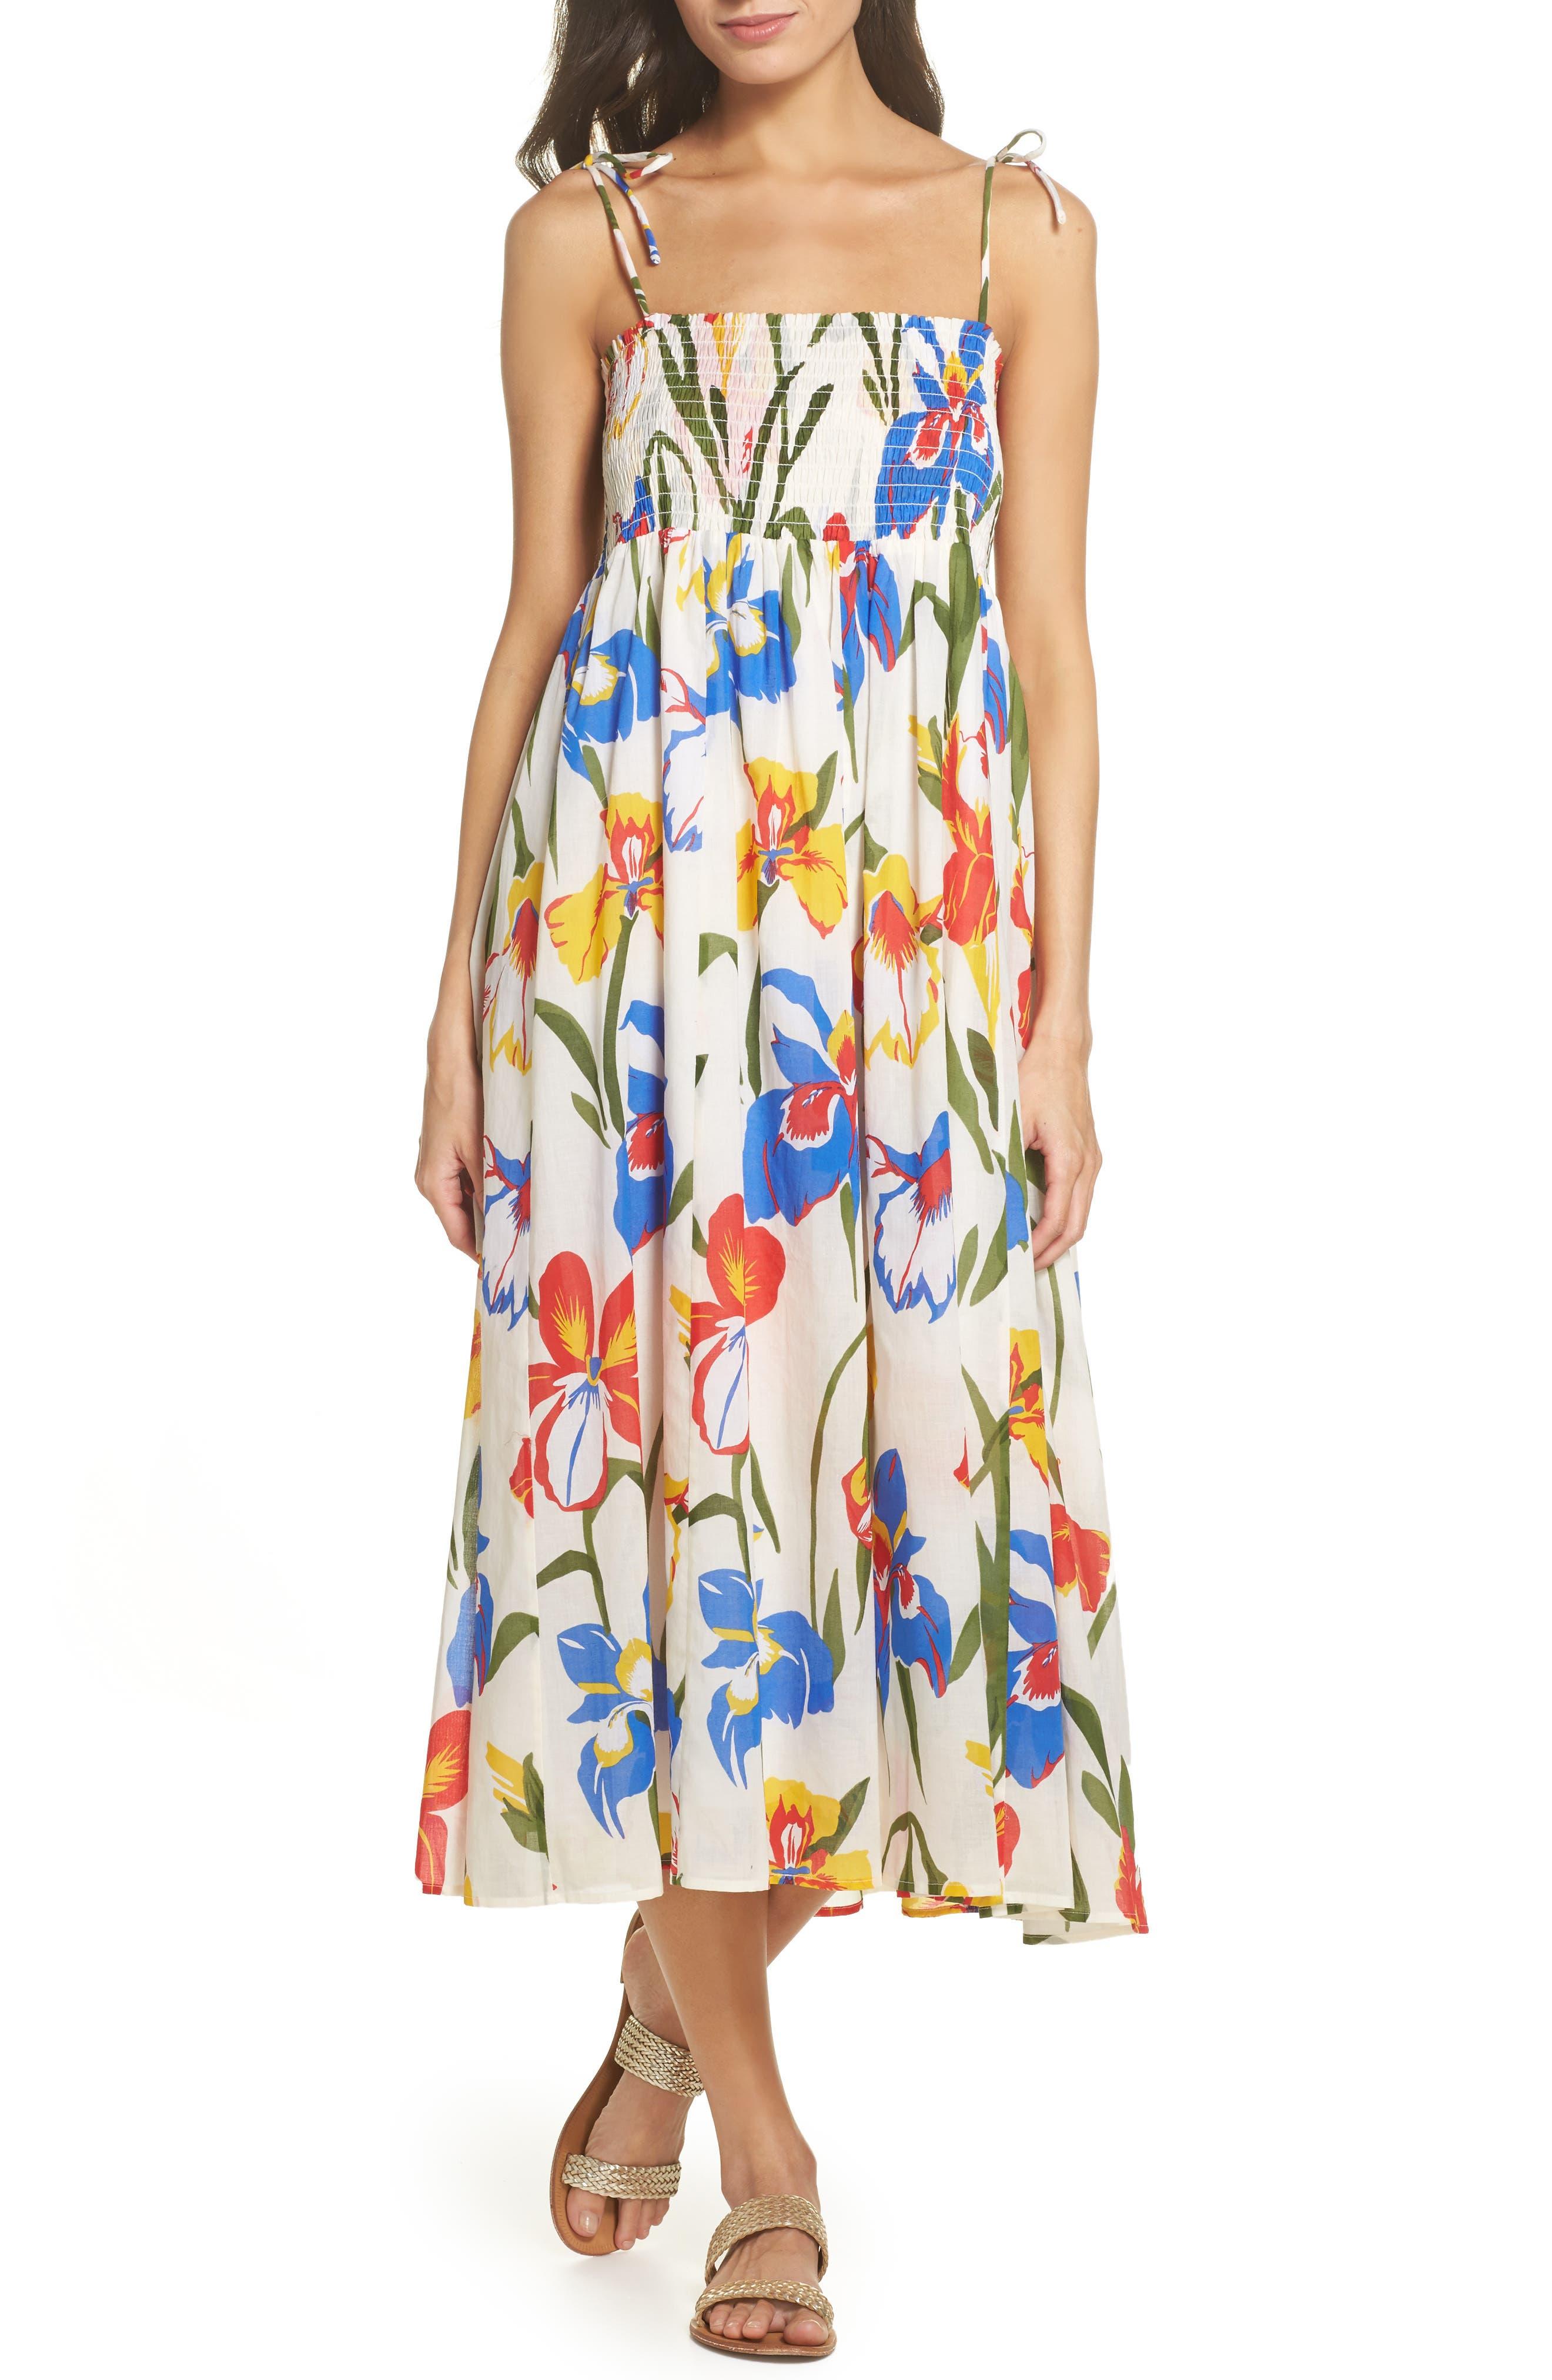 Tory Burch Painter Iris Convertible Cover-Up Dress